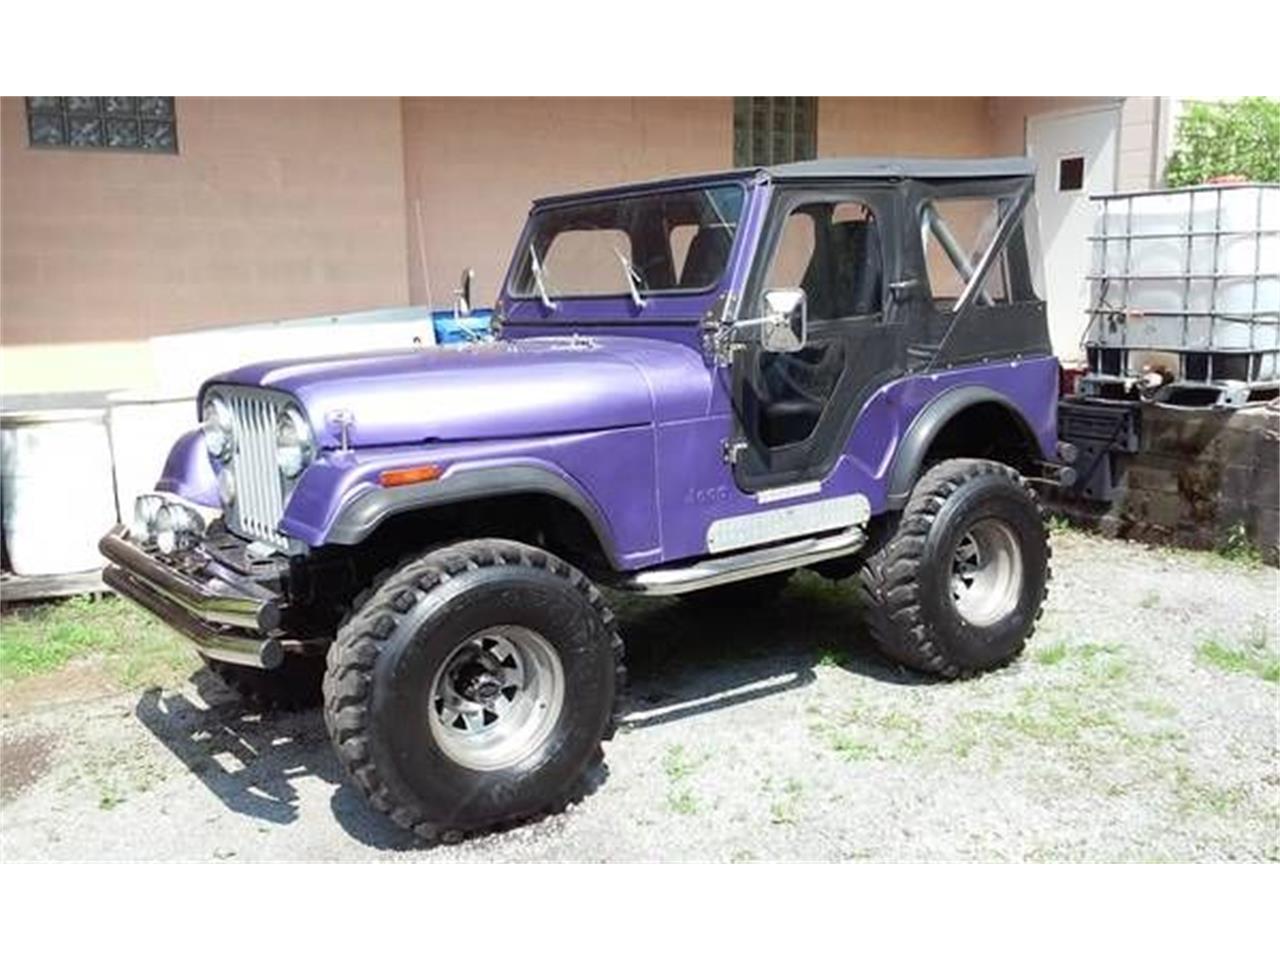 for sale 1977 jeep cj5 in cadillac, michigan cars - cadillac, mi at geebo